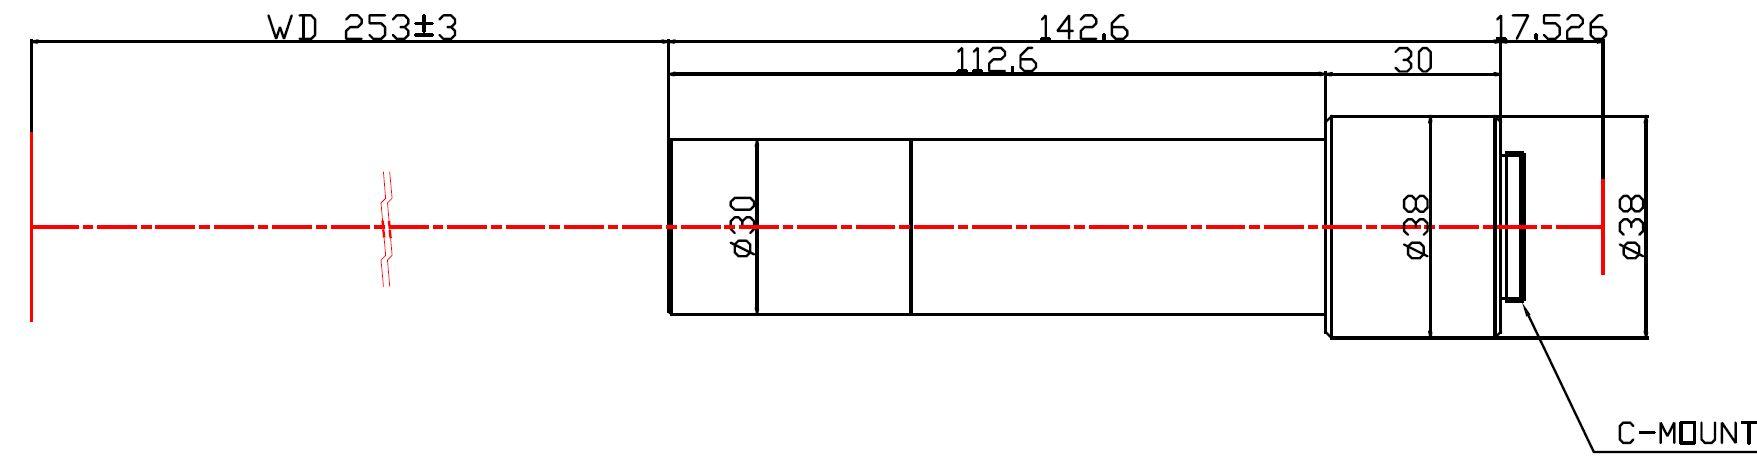 Lensagon MC4M-05-253